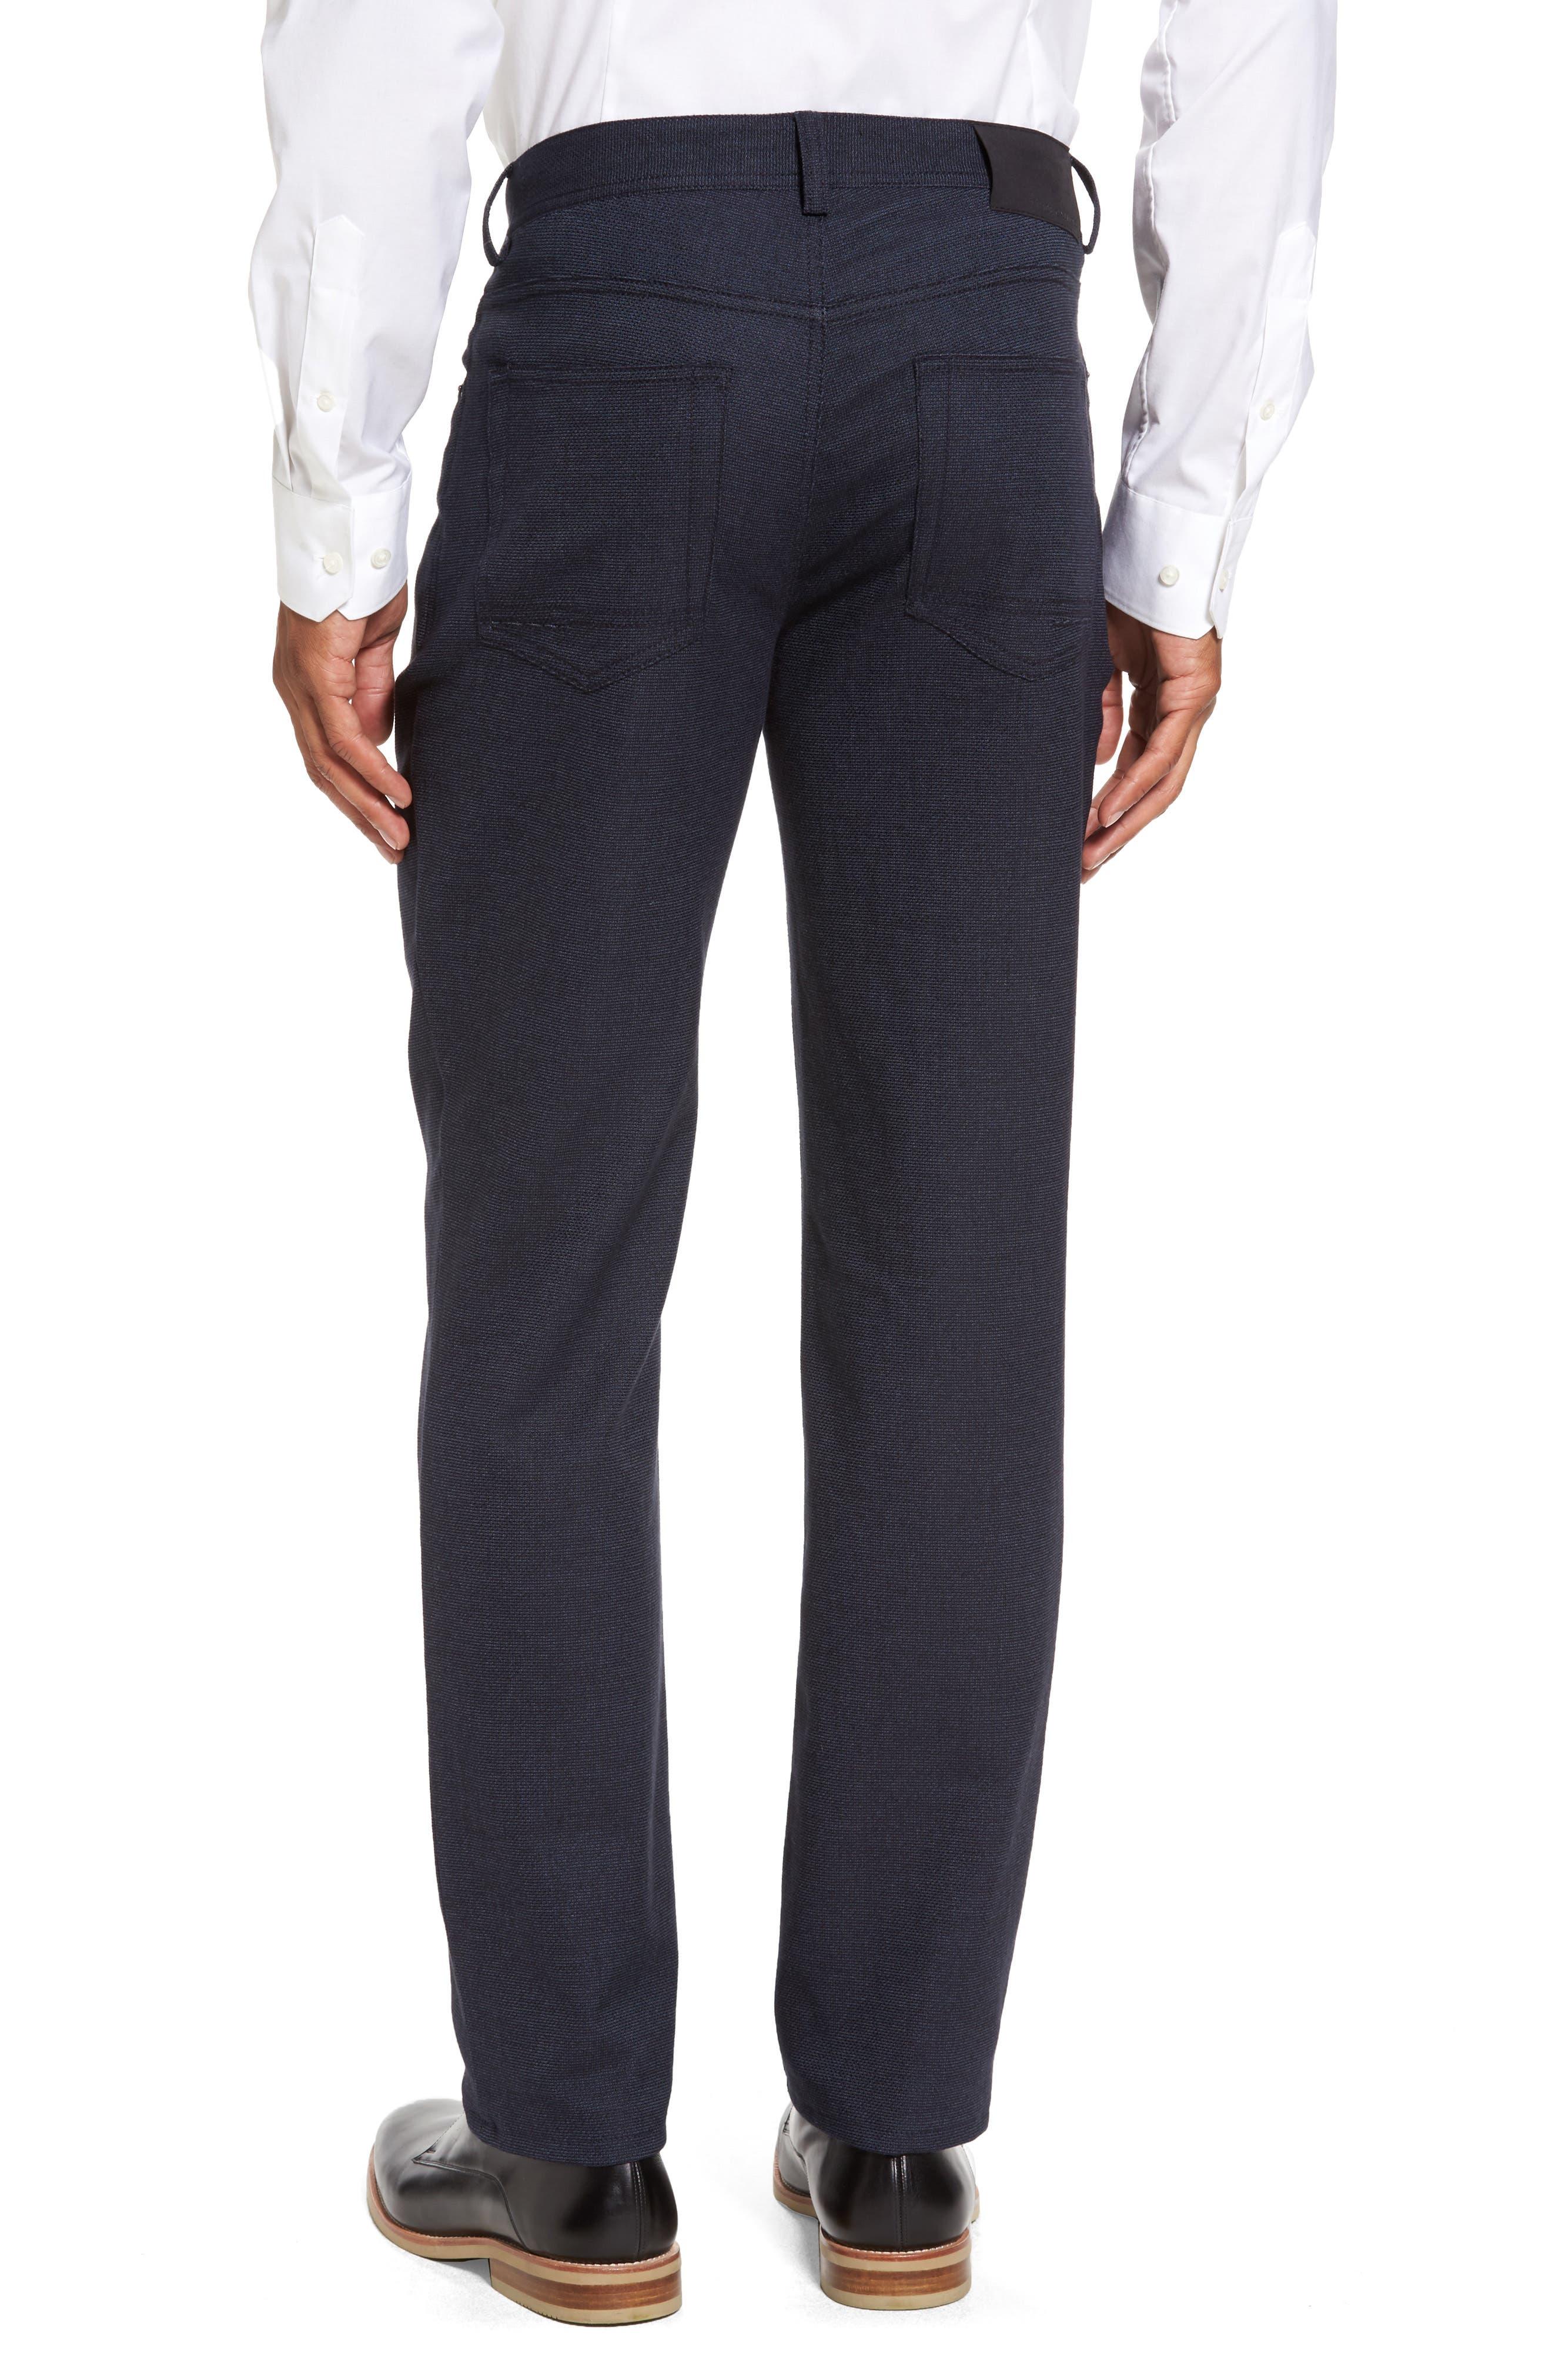 Vince Slim Fit Stretch Five-Pocket Pants,                             Alternate thumbnail 2, color,                             Navy Digital Neat